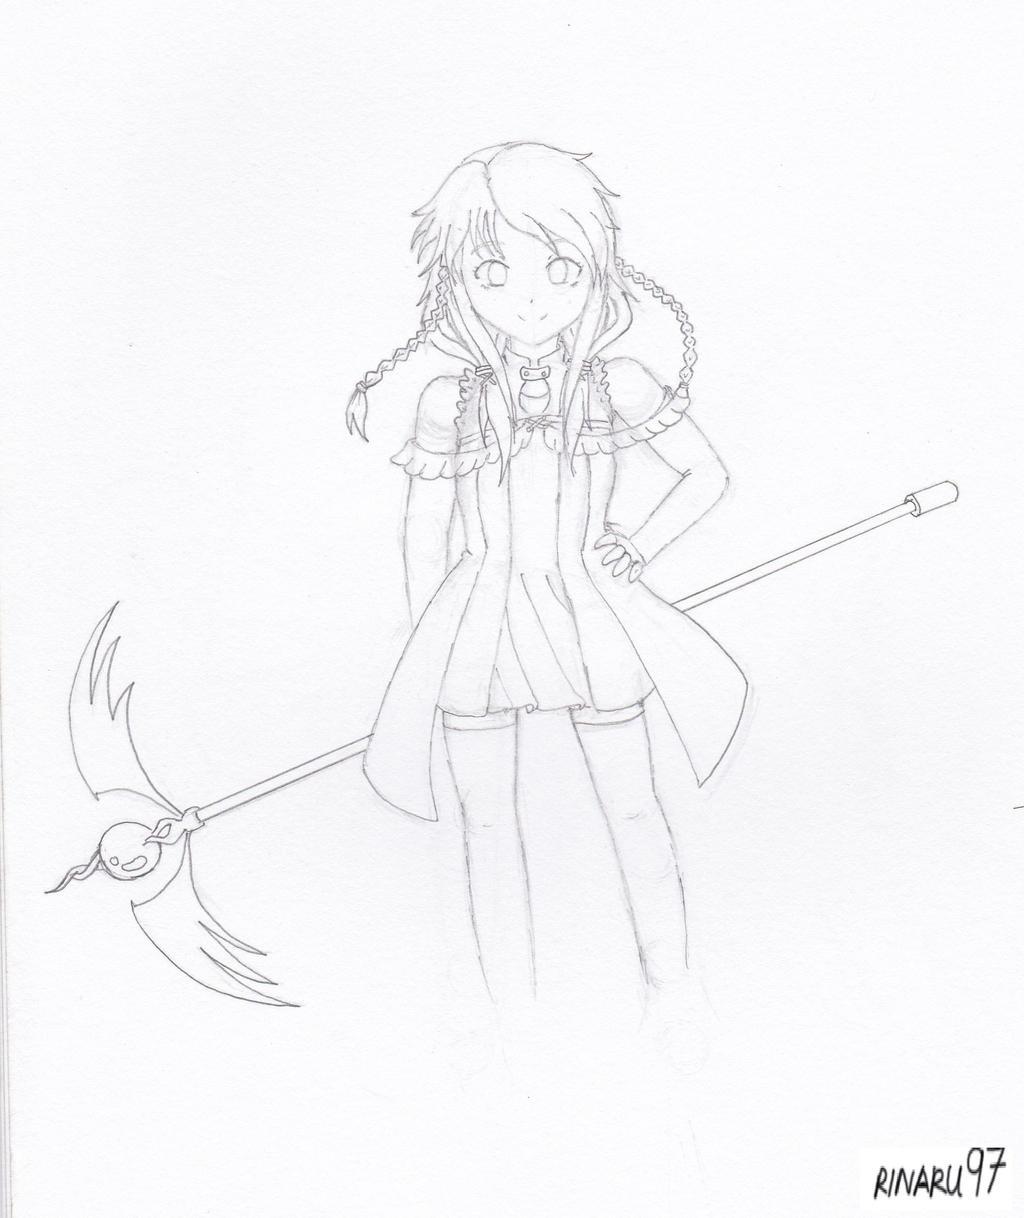 Anime Magician Drawing